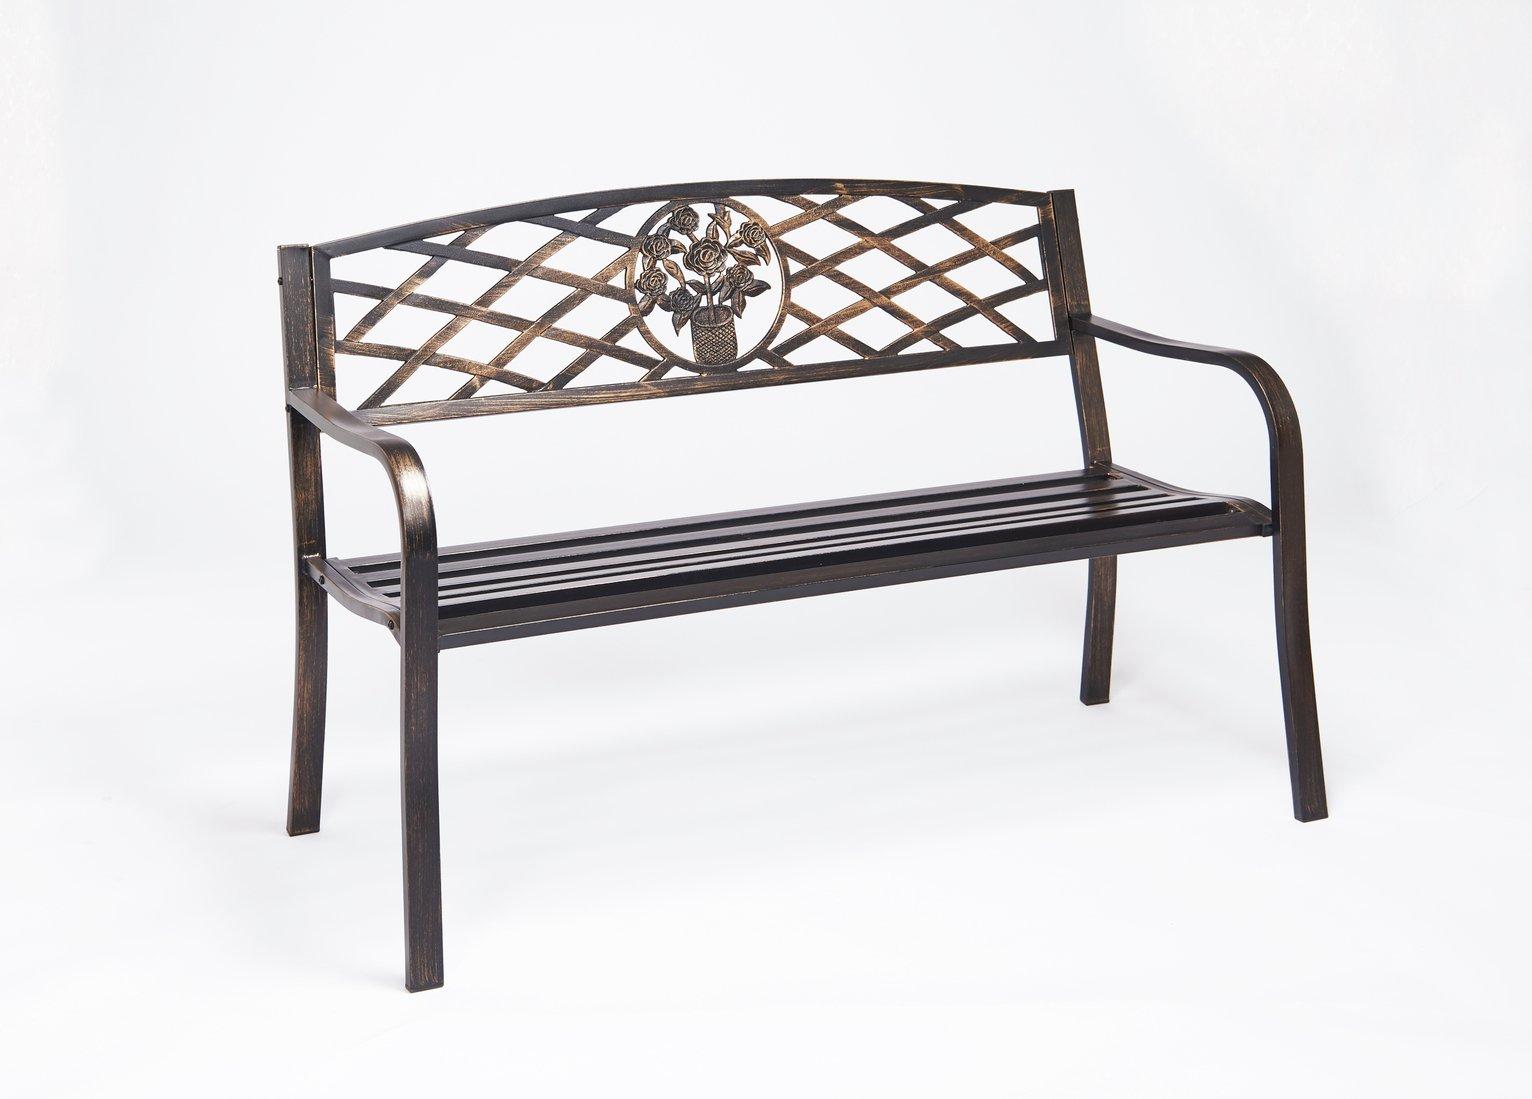 Greenhurst 2 Seater Garden Bench with Cast Iron Back Rest